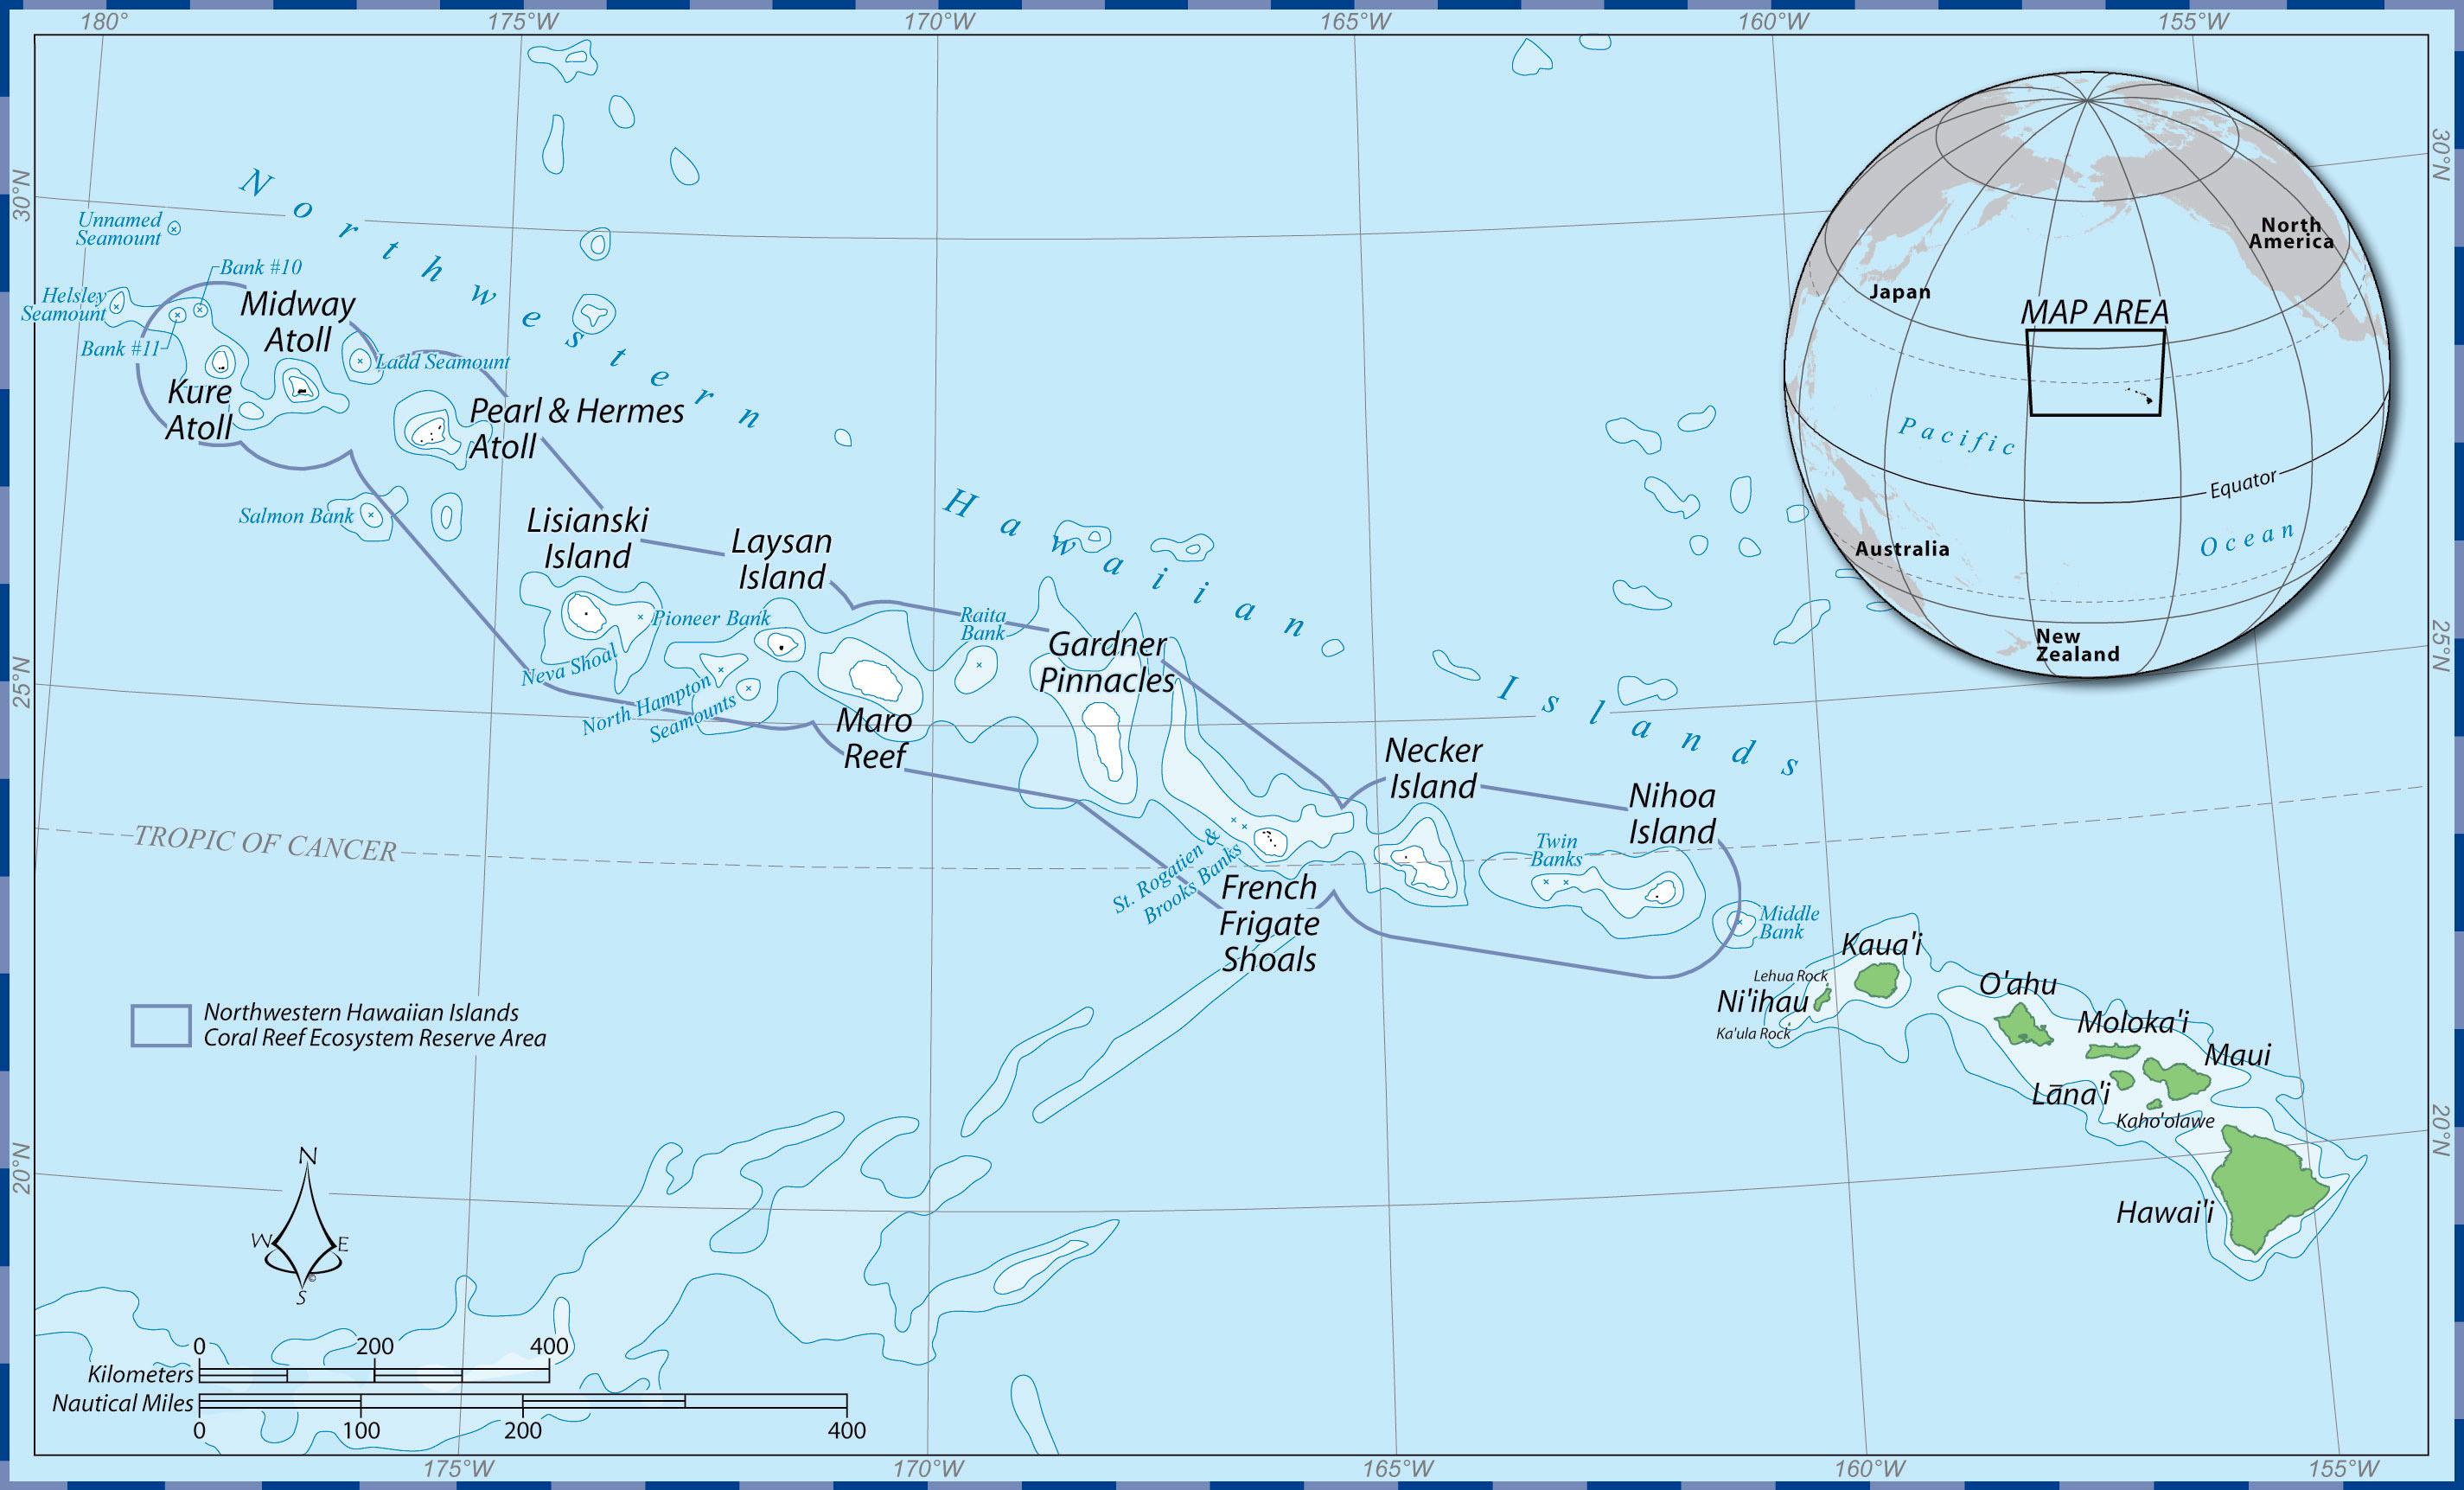 Worksheet. Rising Sea Levels Threaten Hawaiian Sea Turtles Nesting Sites